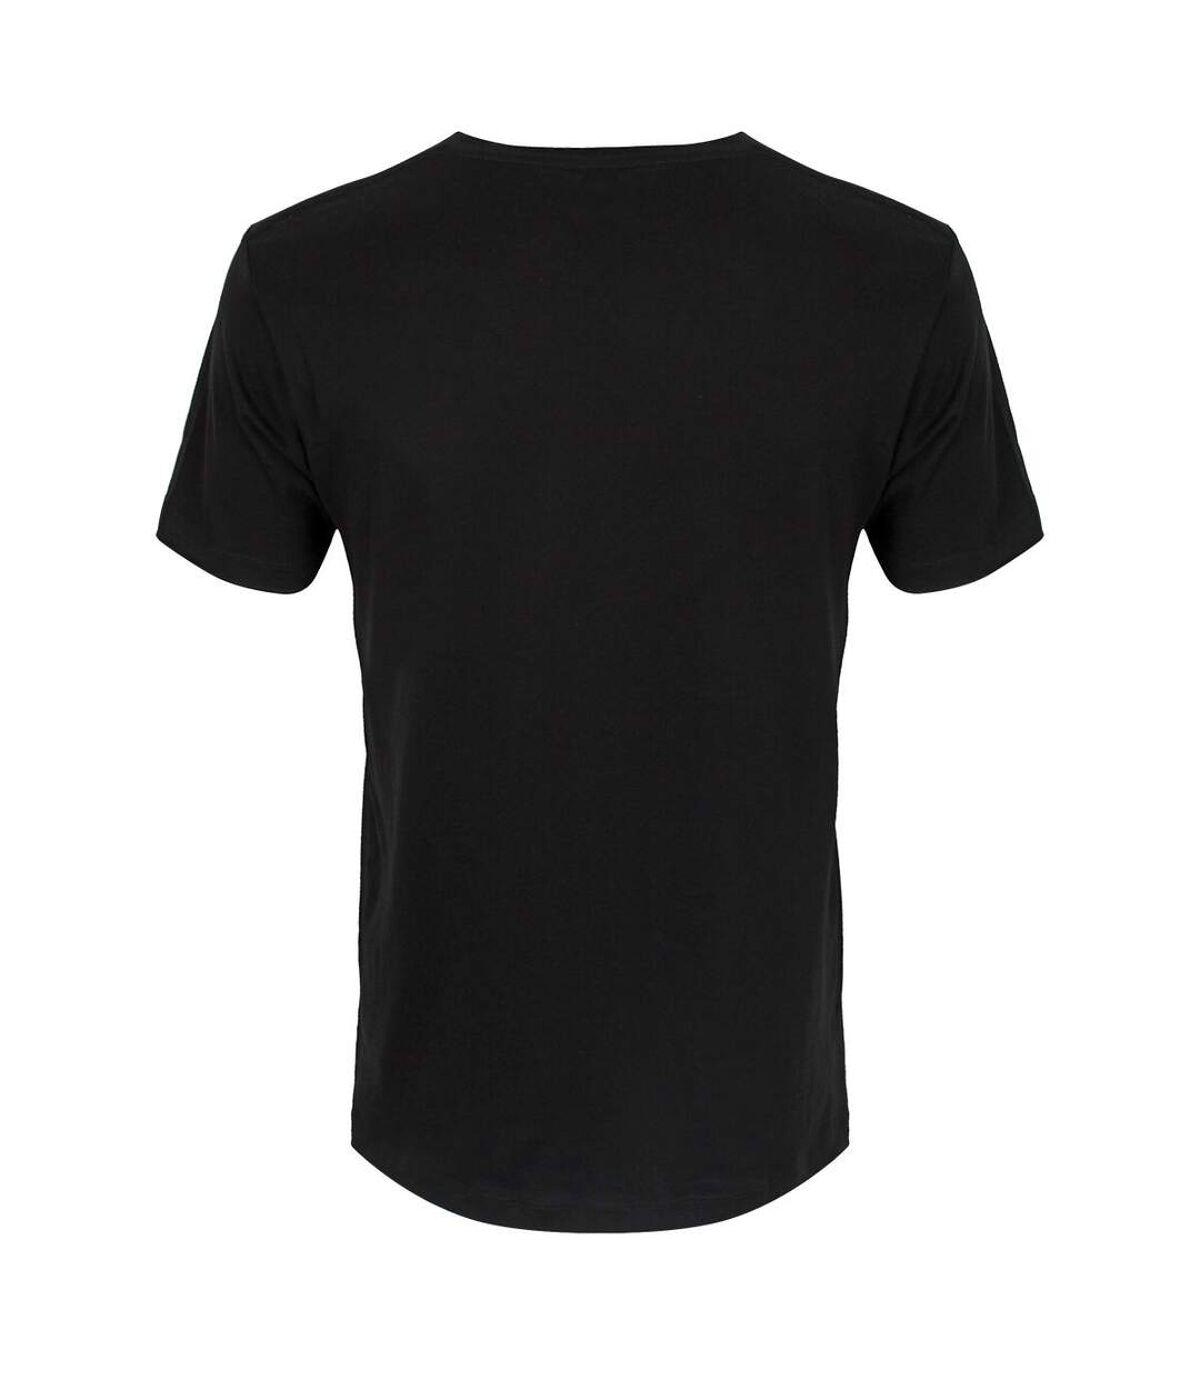 Tokyo Spirit Mens Oka Monochrome T-Shirt (Black) - UTGR4118